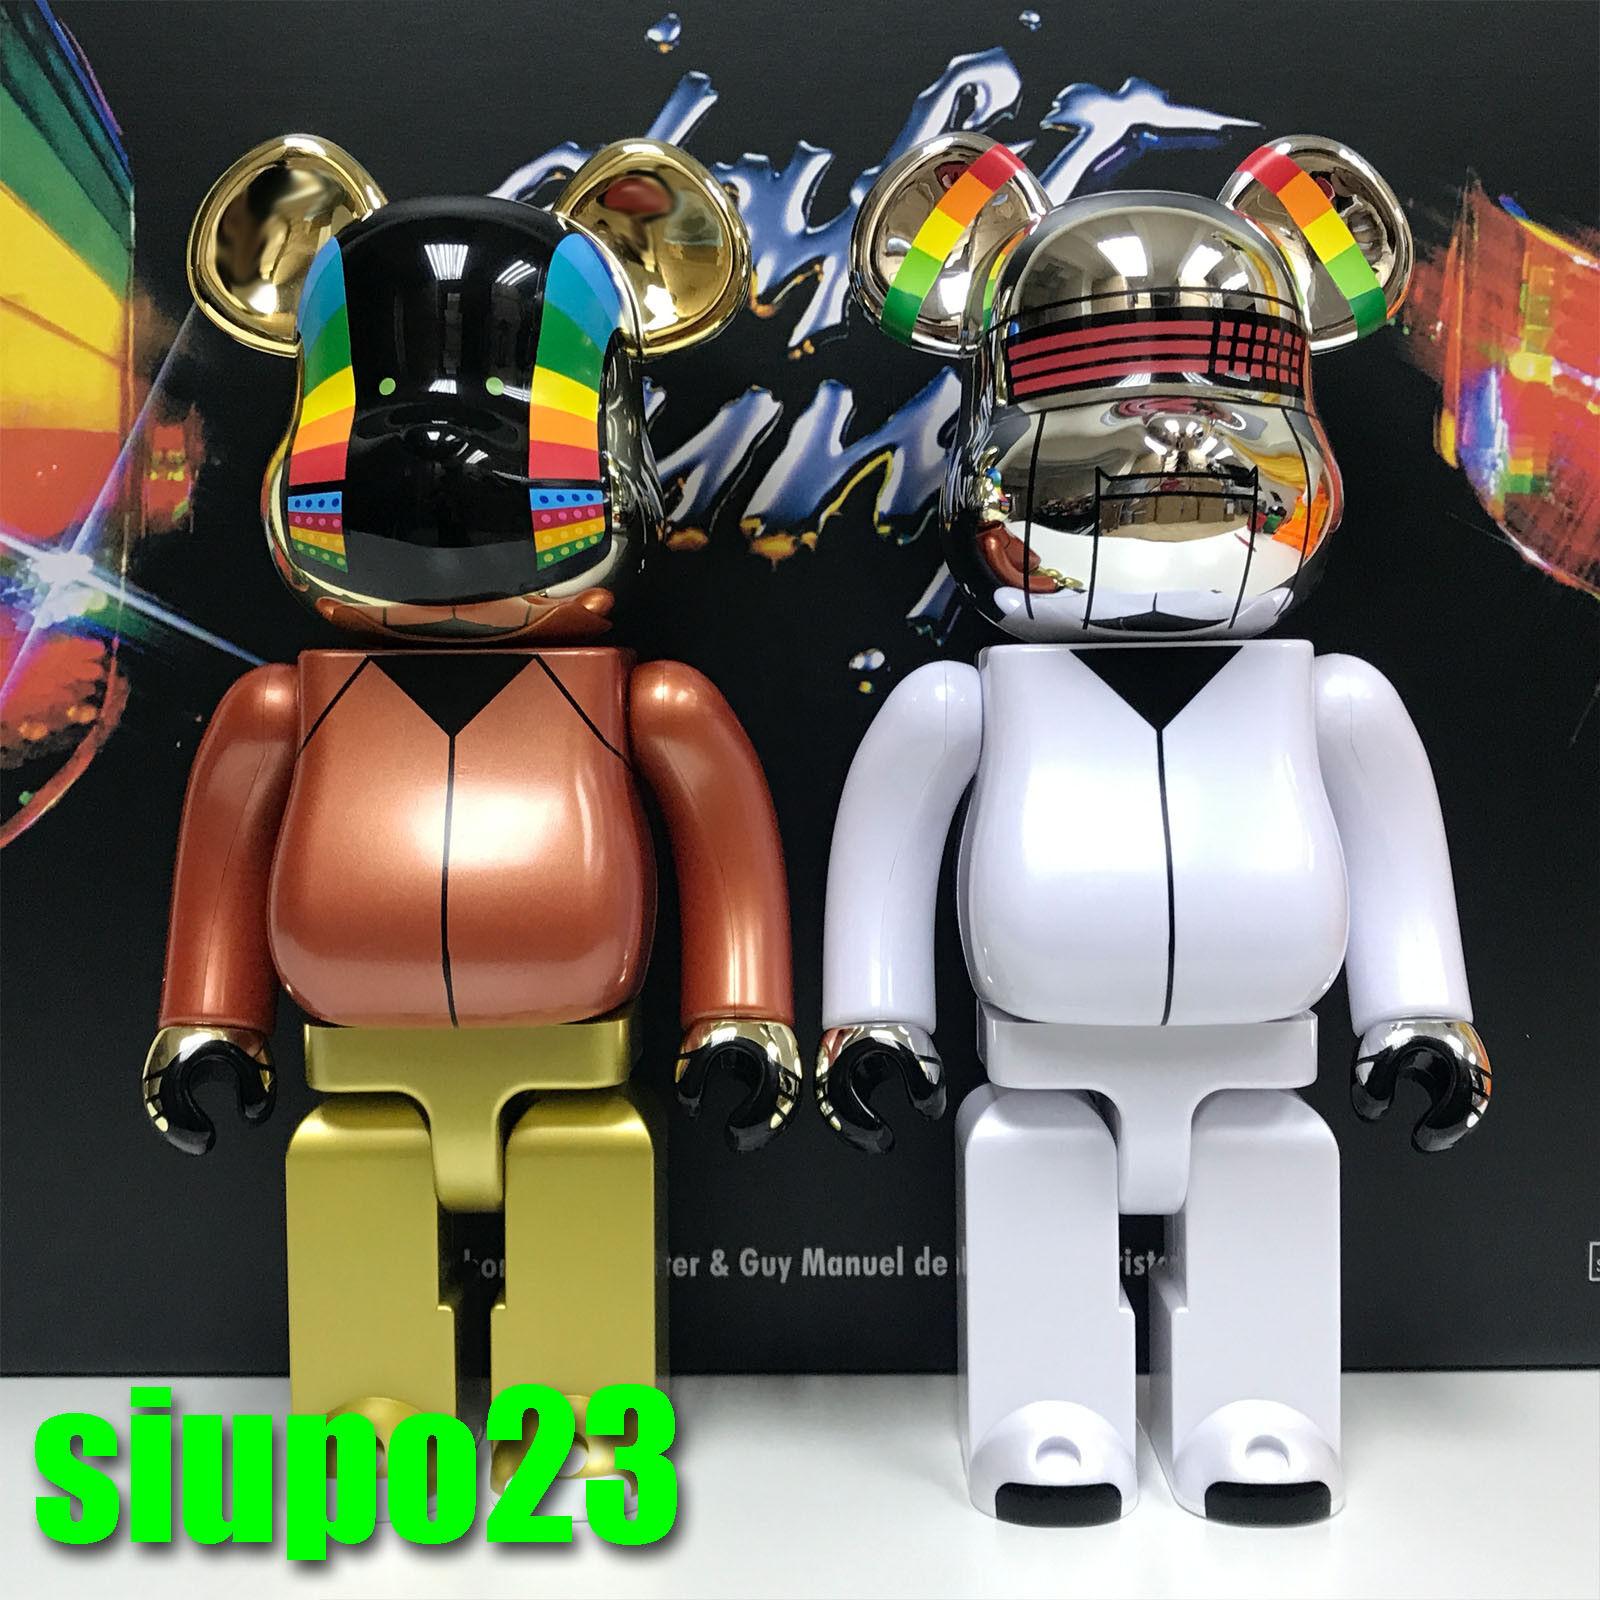 Medicom 400% Orbarbrick  Daft Punk Be@rbrick Discovery Ver 2p